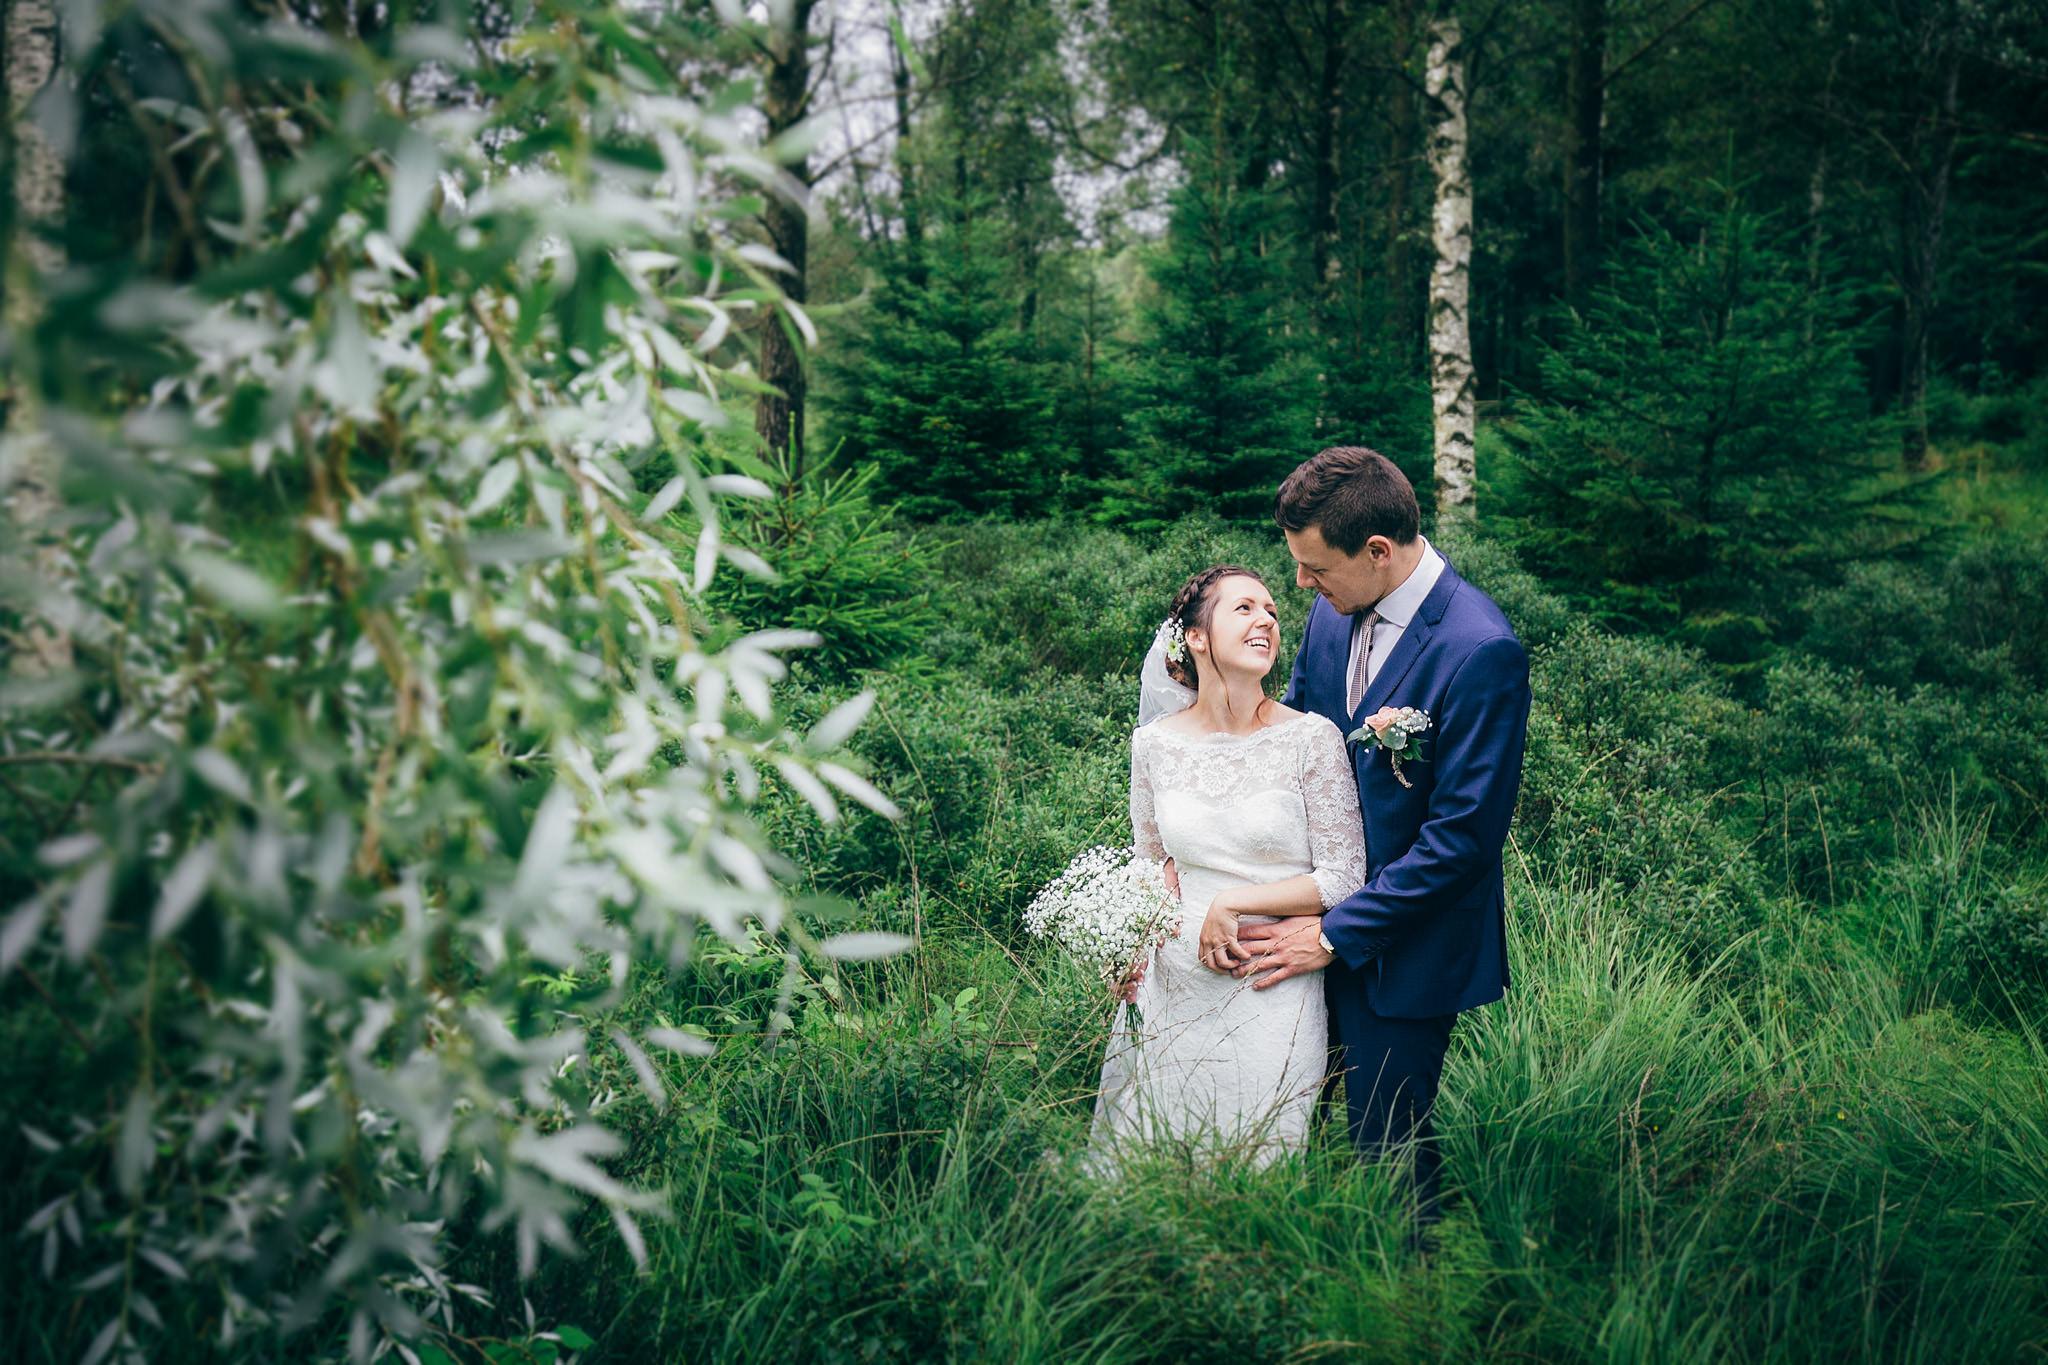 Norway+wedding+photographer+elopement+pre+wedding+Casey+Arneson-57.jpg